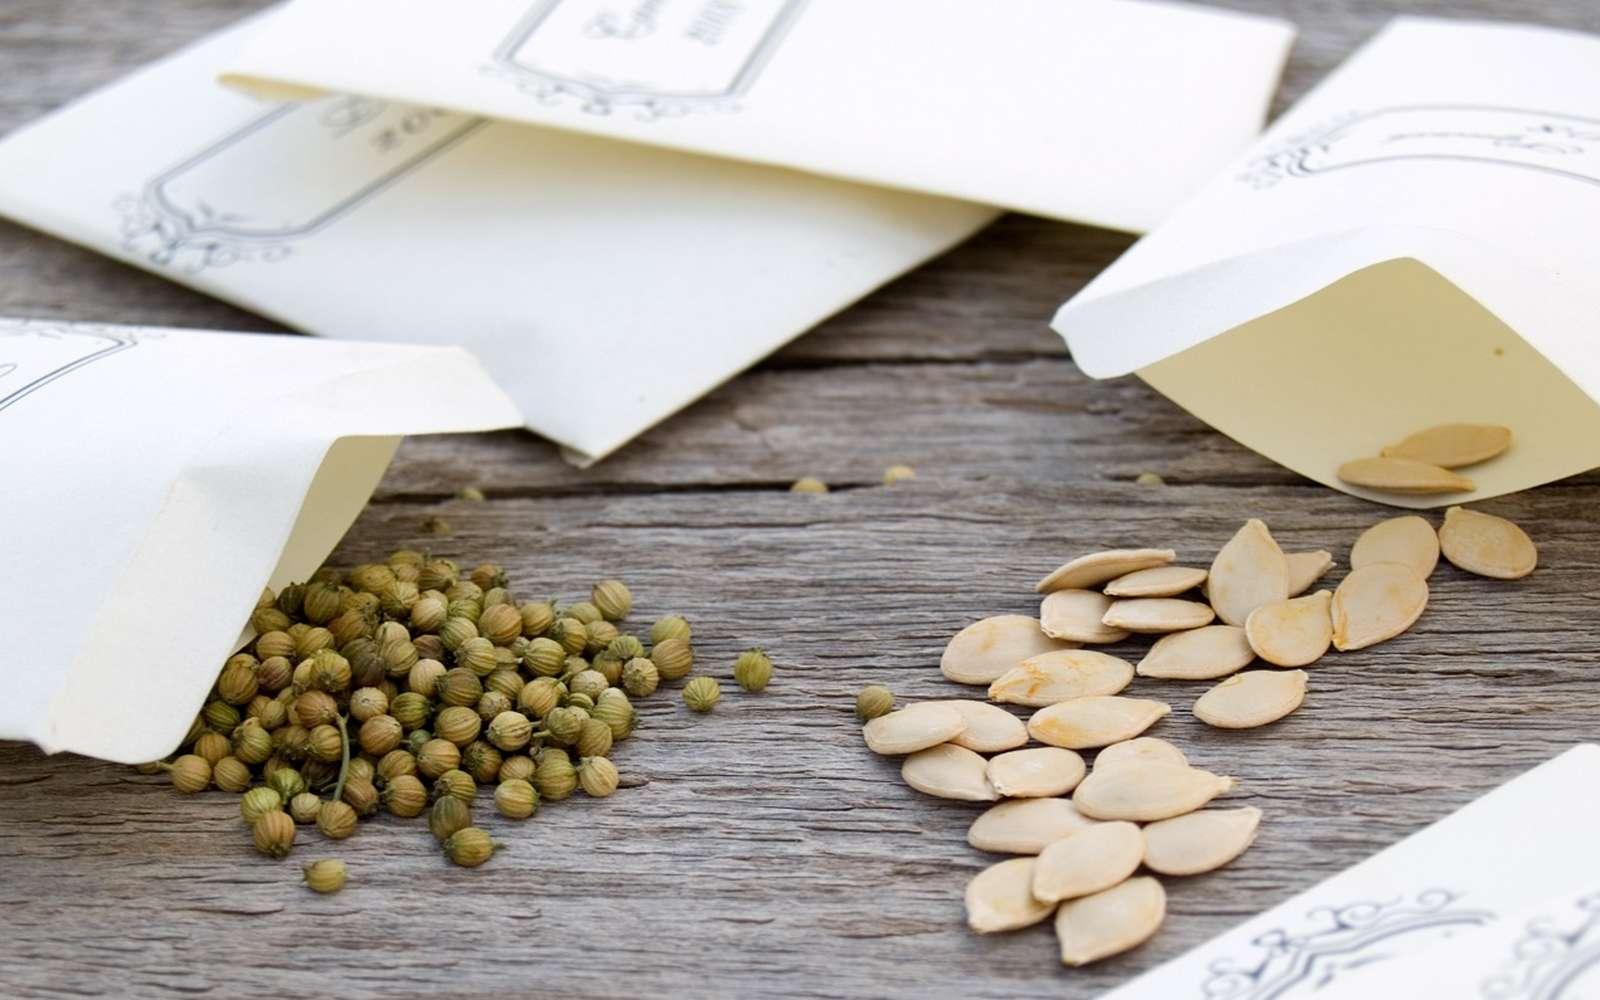 Réussir ses semences de légumes. © monamakela, Adobe Stock